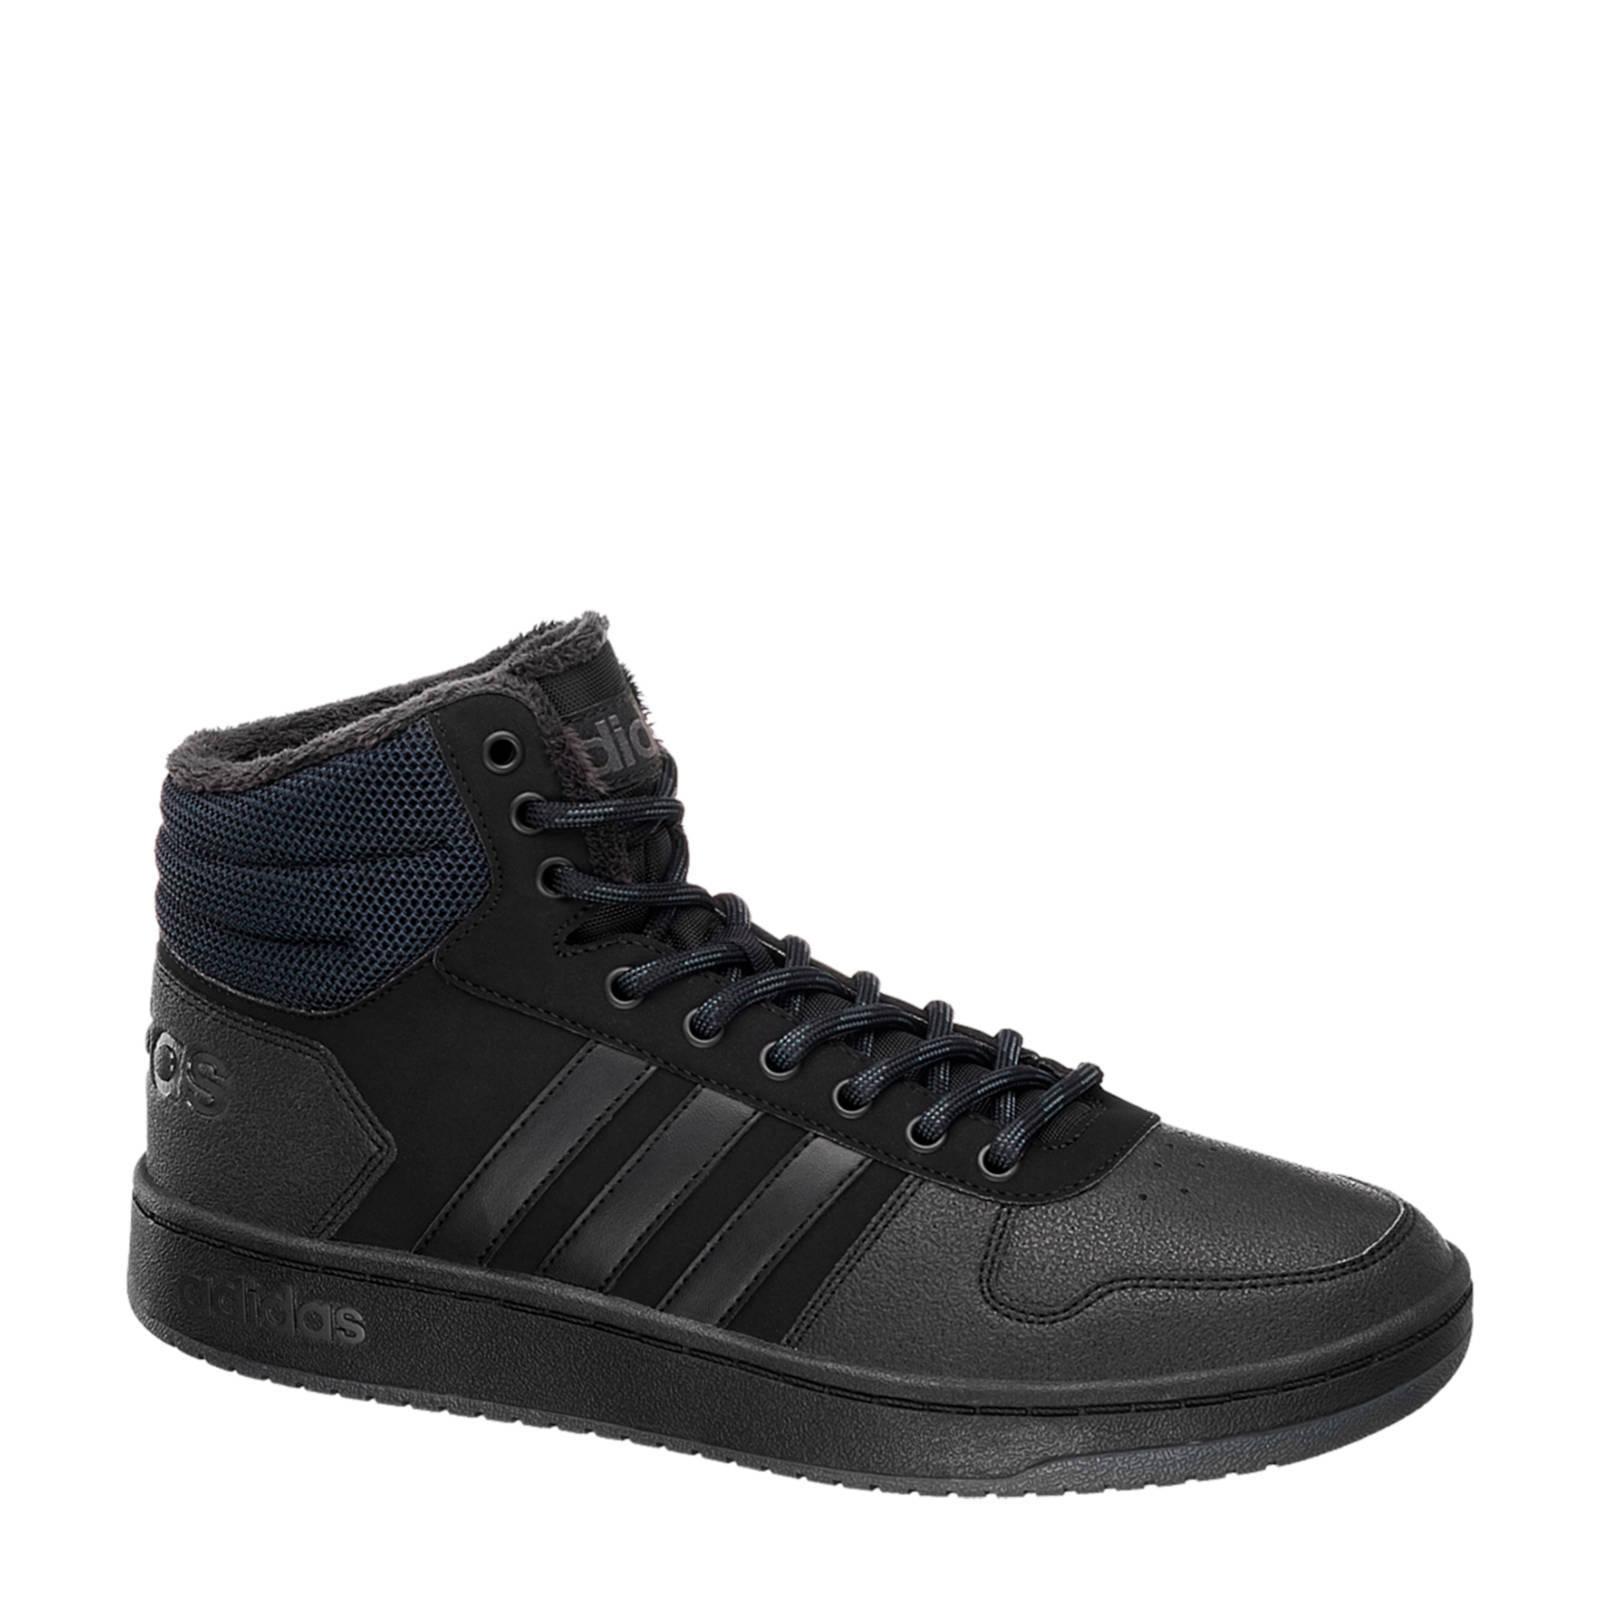 Mid 0 Zwart Hoops Sneakers Adidas Zwart 2 TqFn7